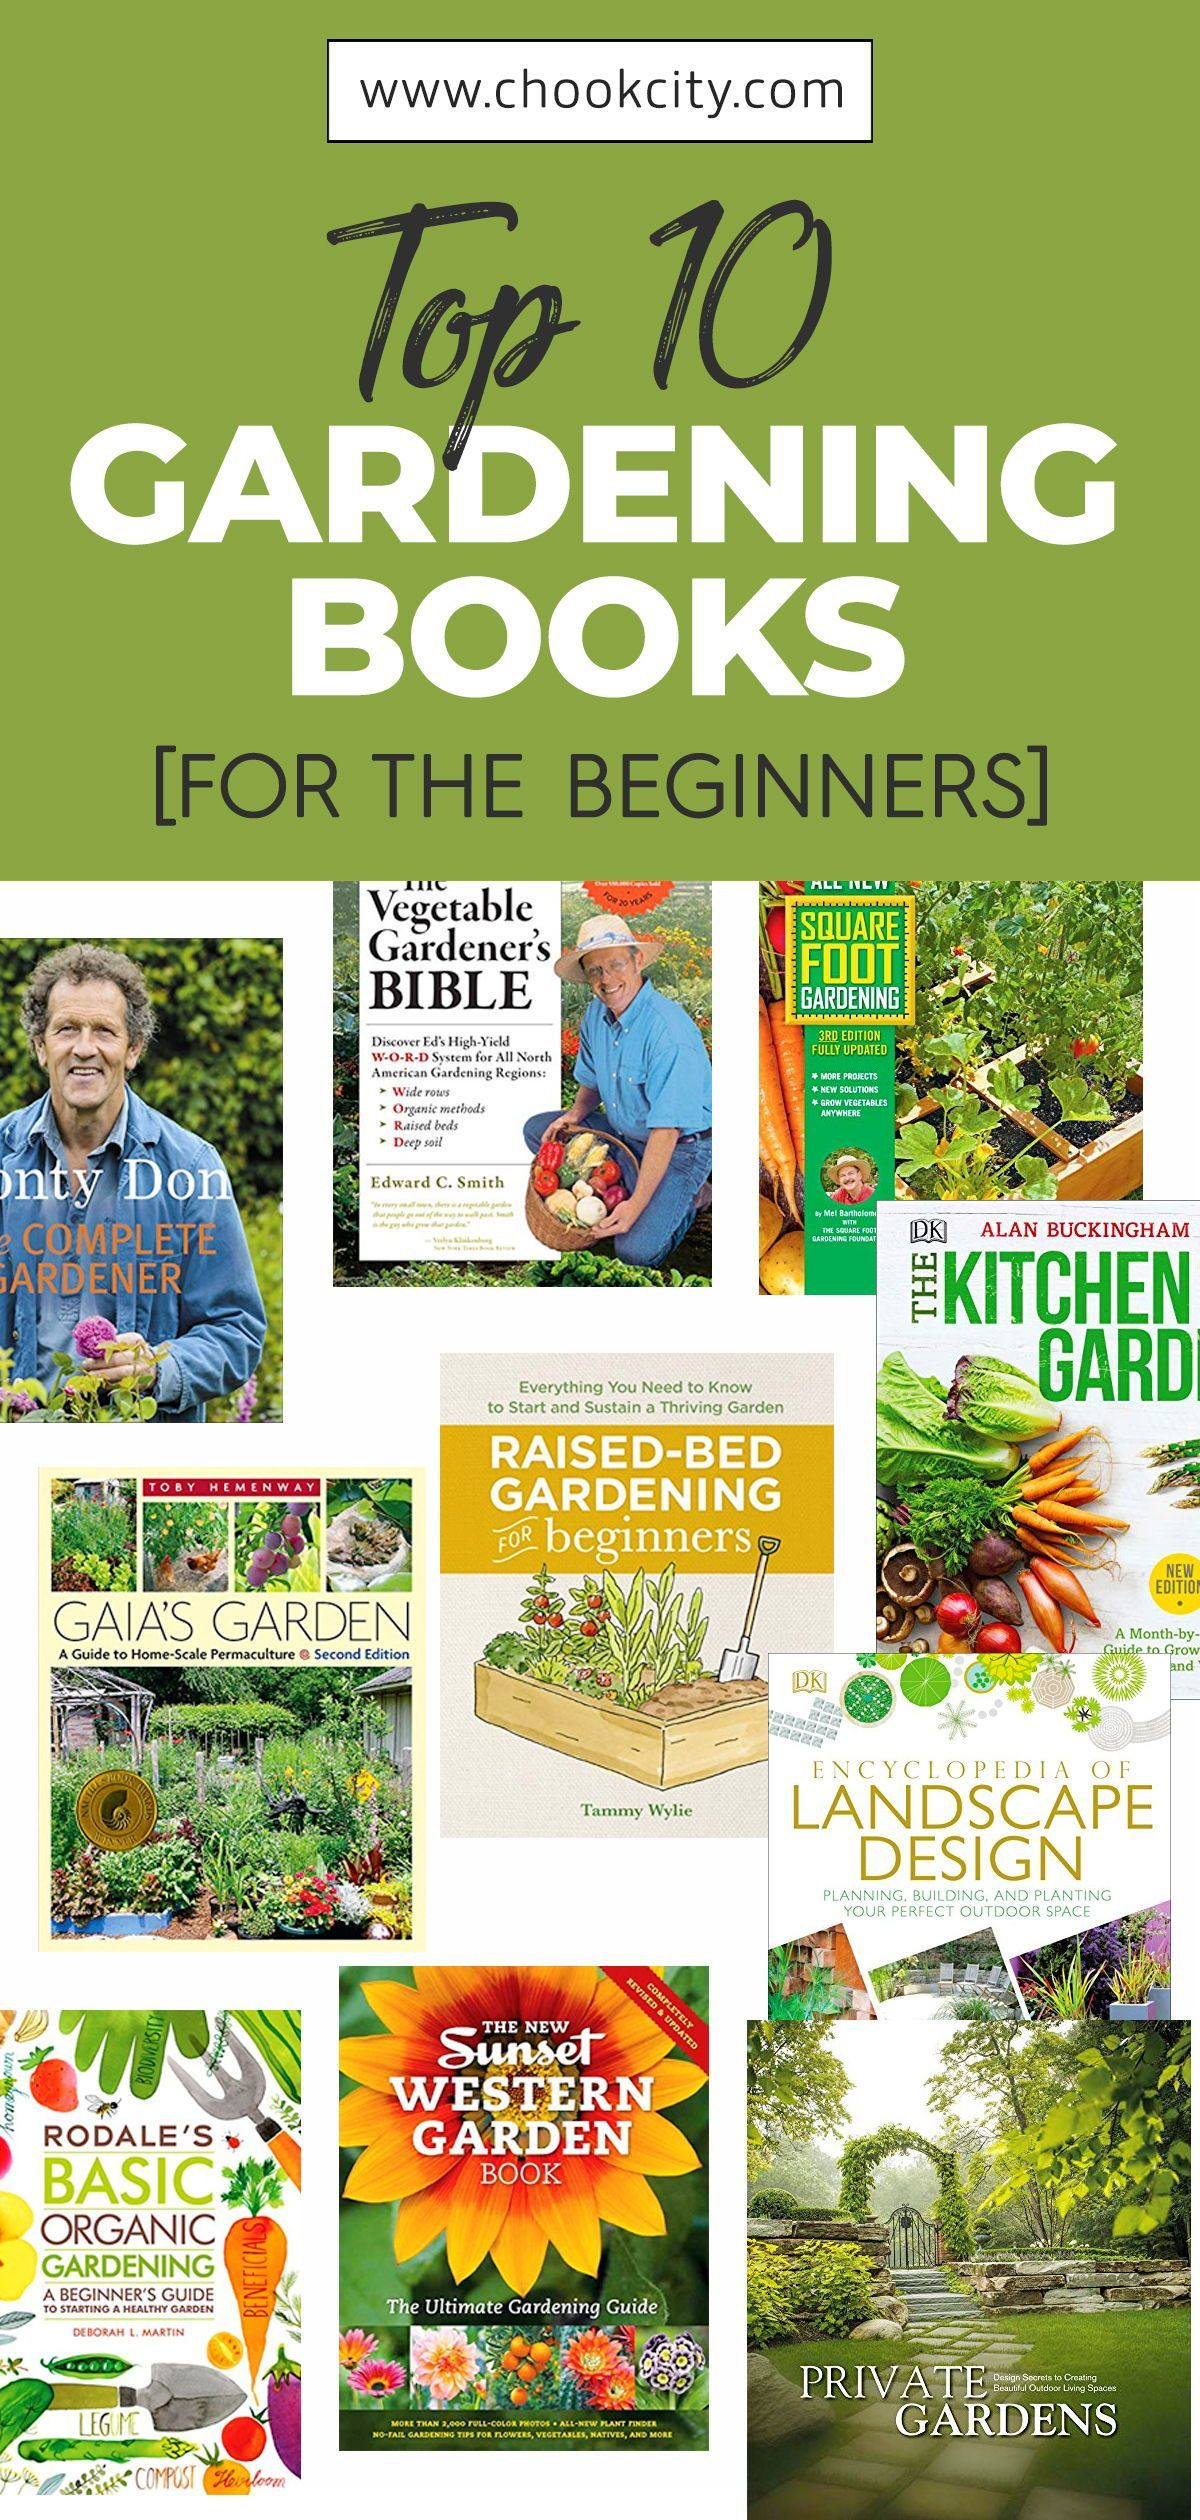 The Best Gardening Books In 2020 Gardening Books Gardening Tips Bible Garden